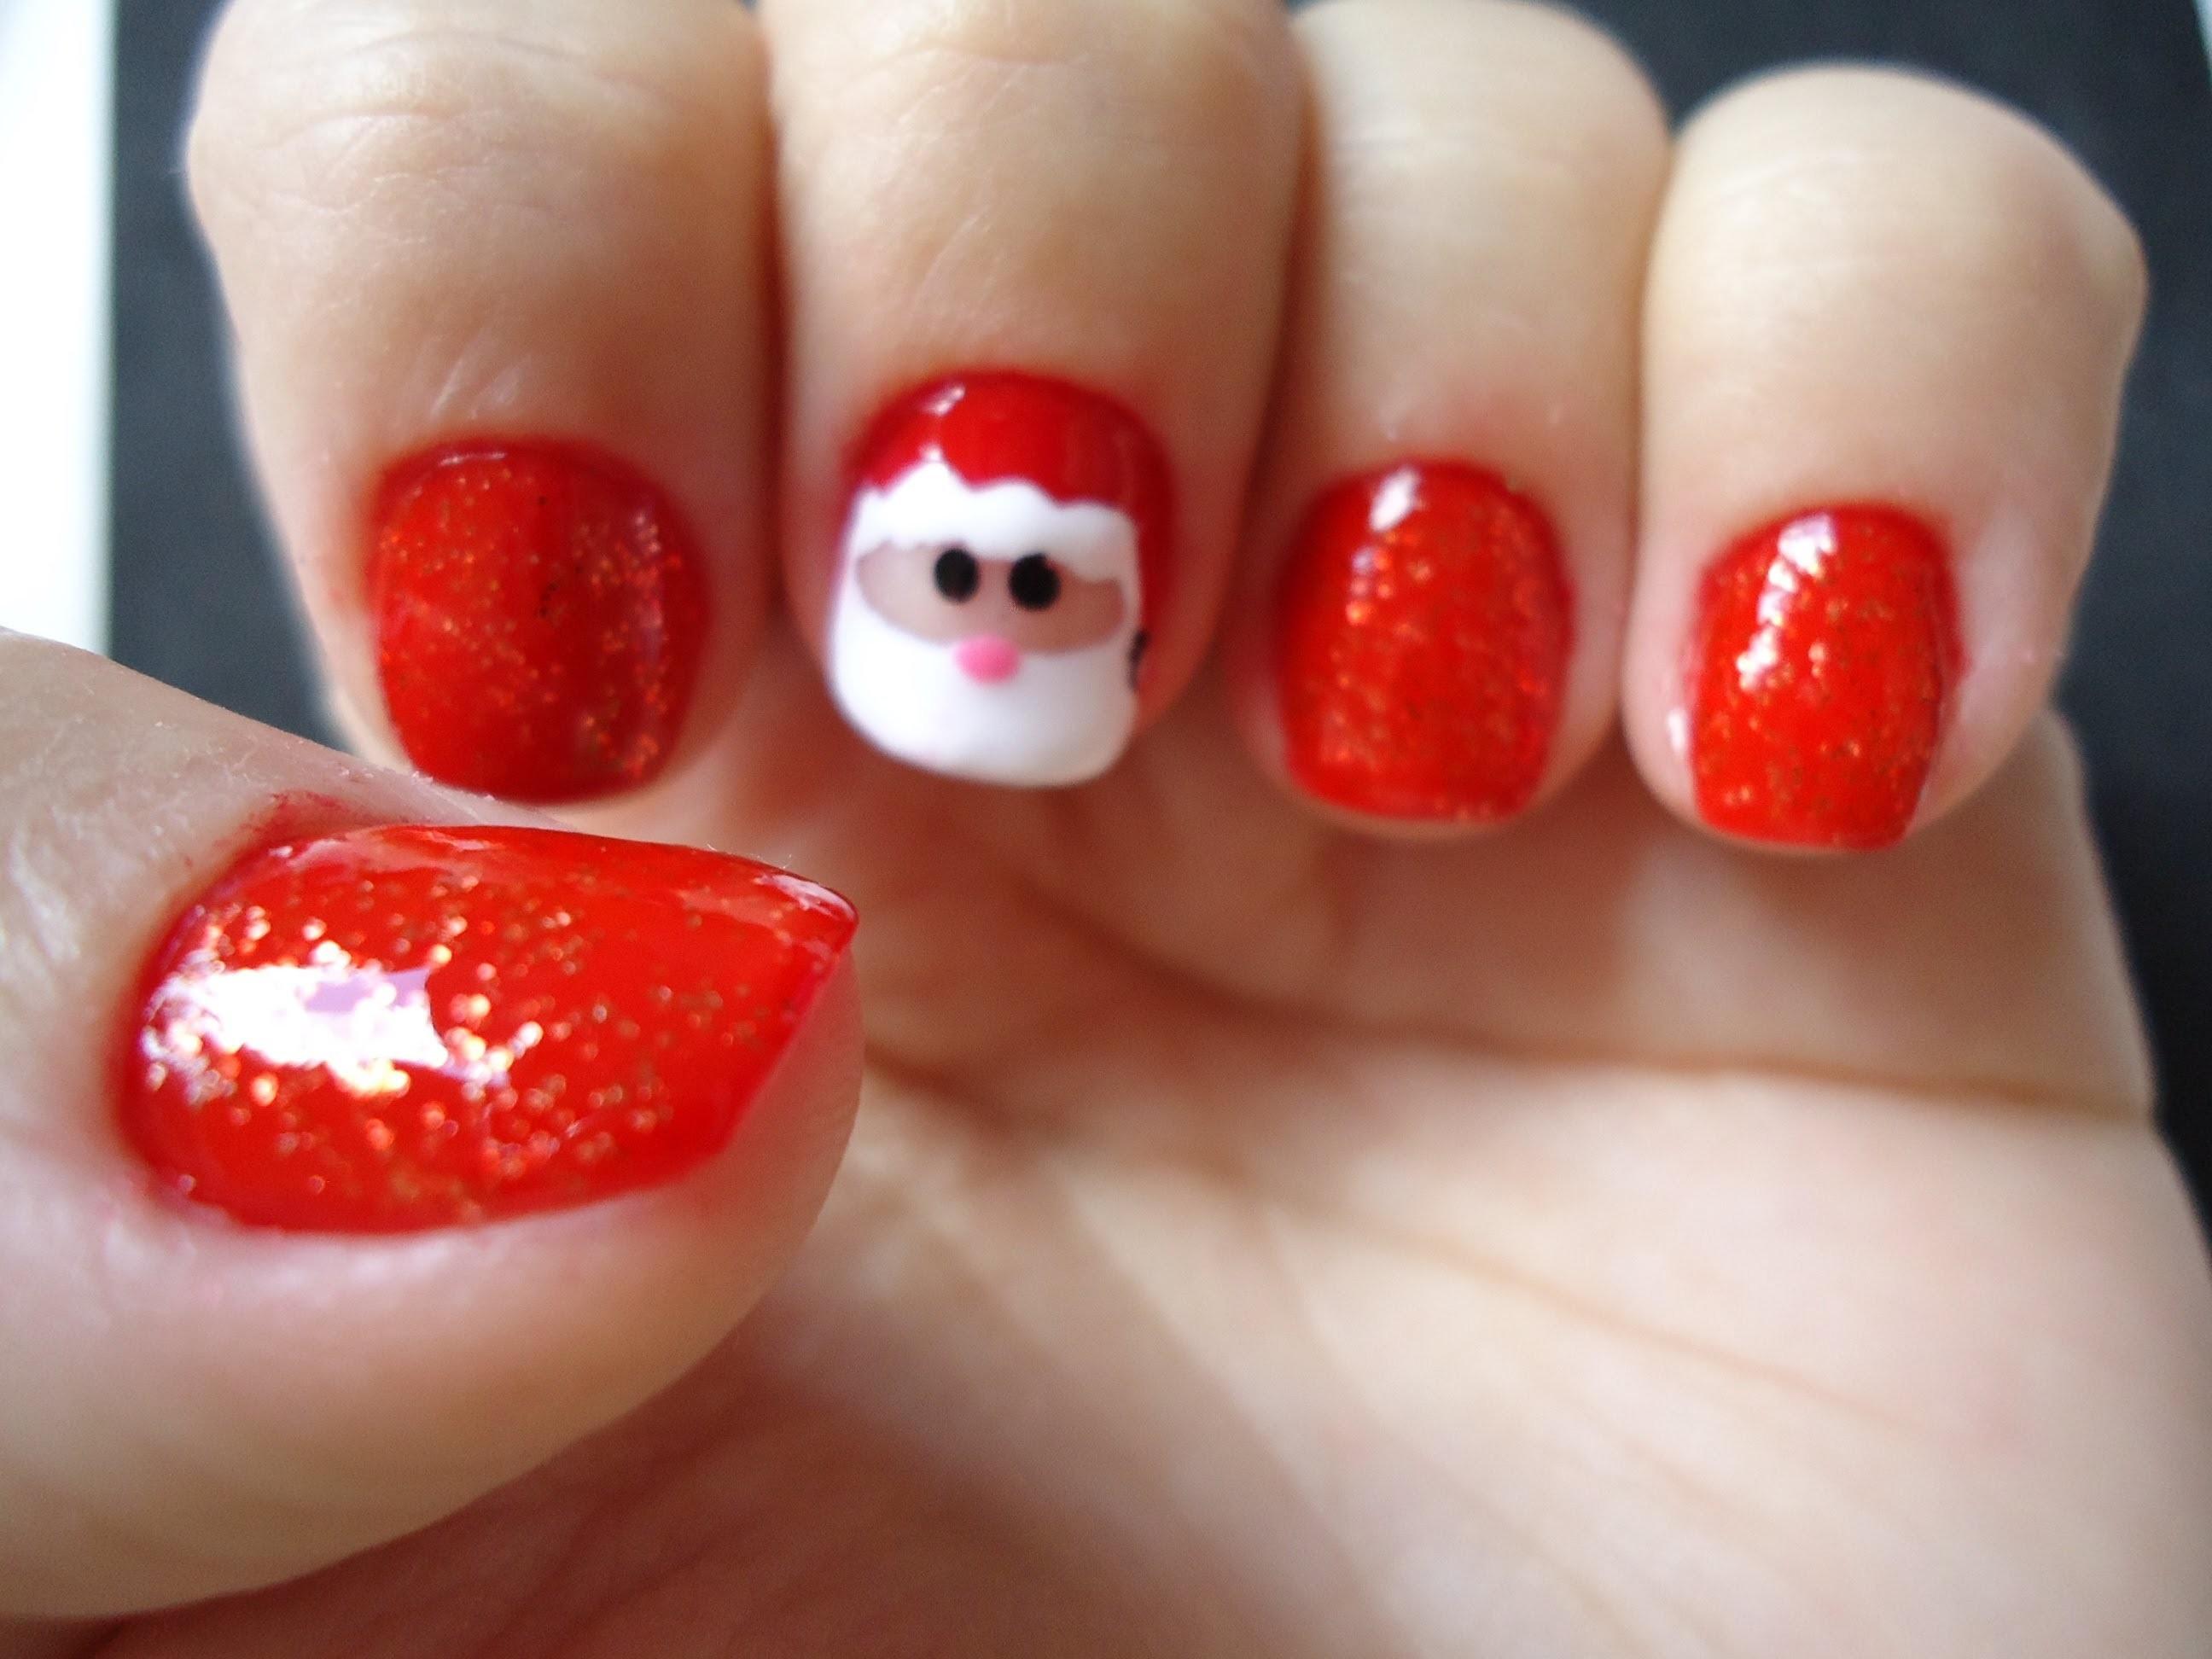 DIY - TUTORIAL UNHAS PARA O NATAL 2 (Christmas nail art)